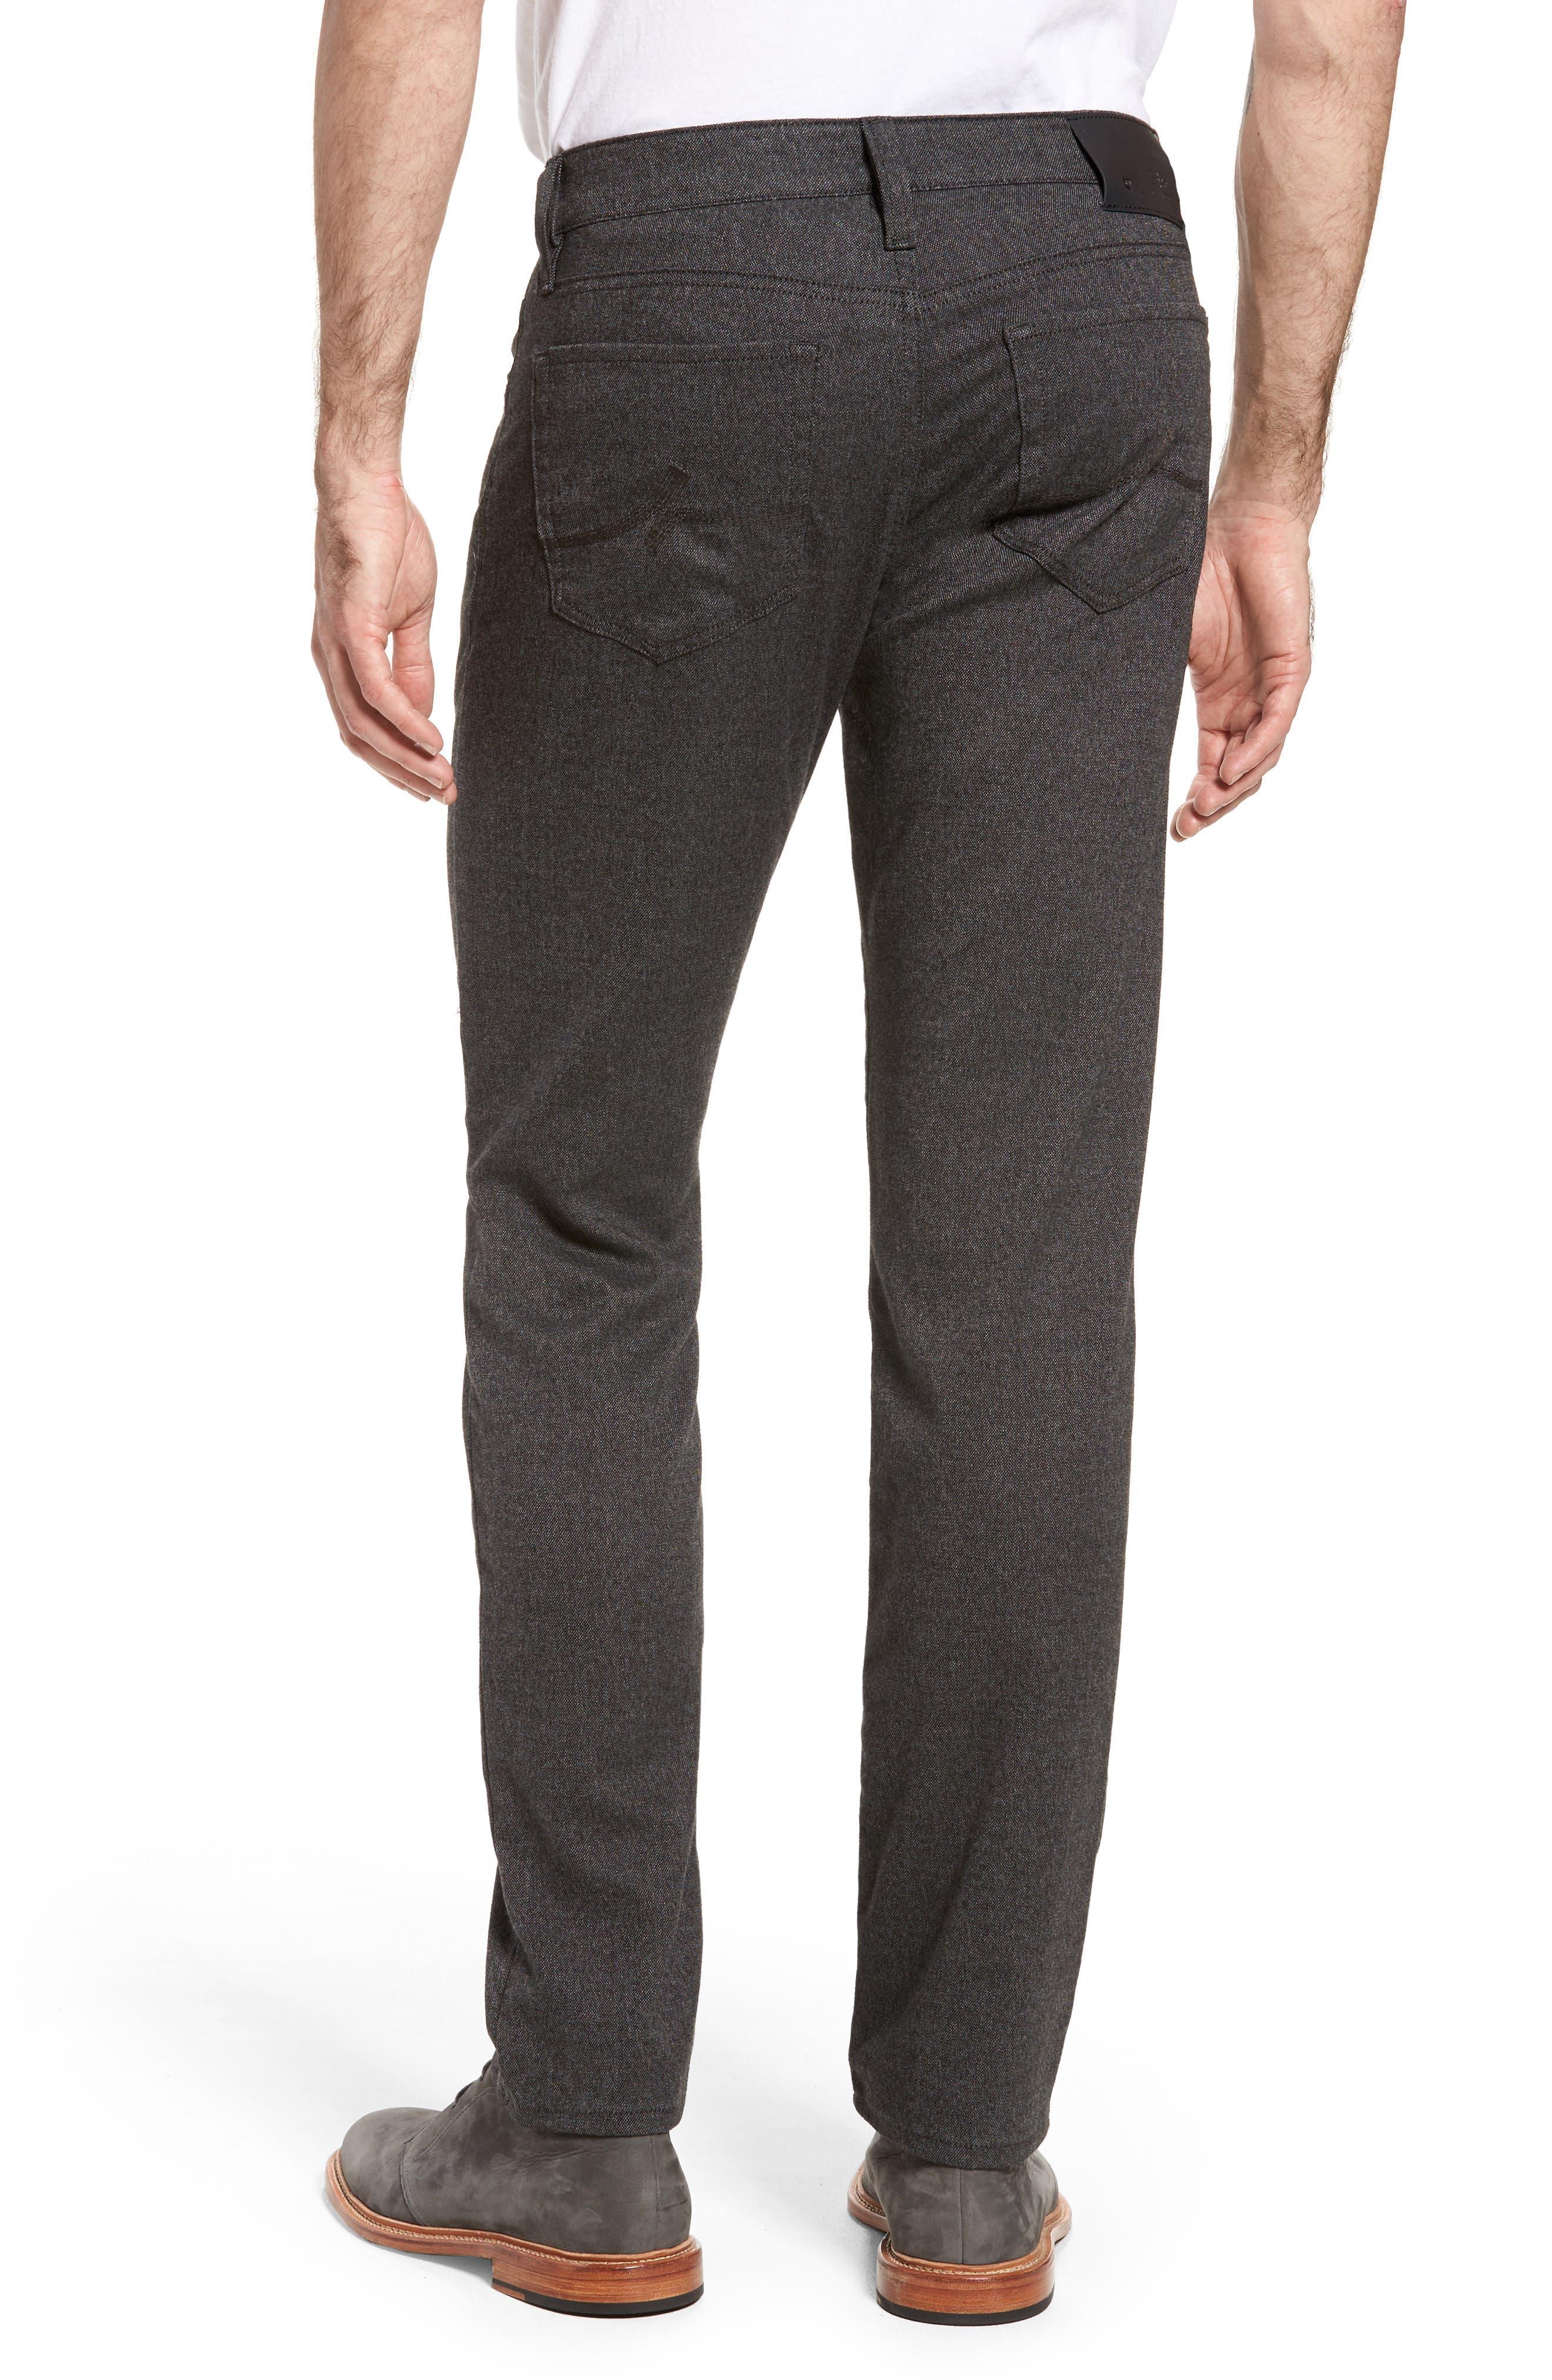 Courage Straight Leg Tweed Pants,                             Alternate thumbnail 2, color,                             020